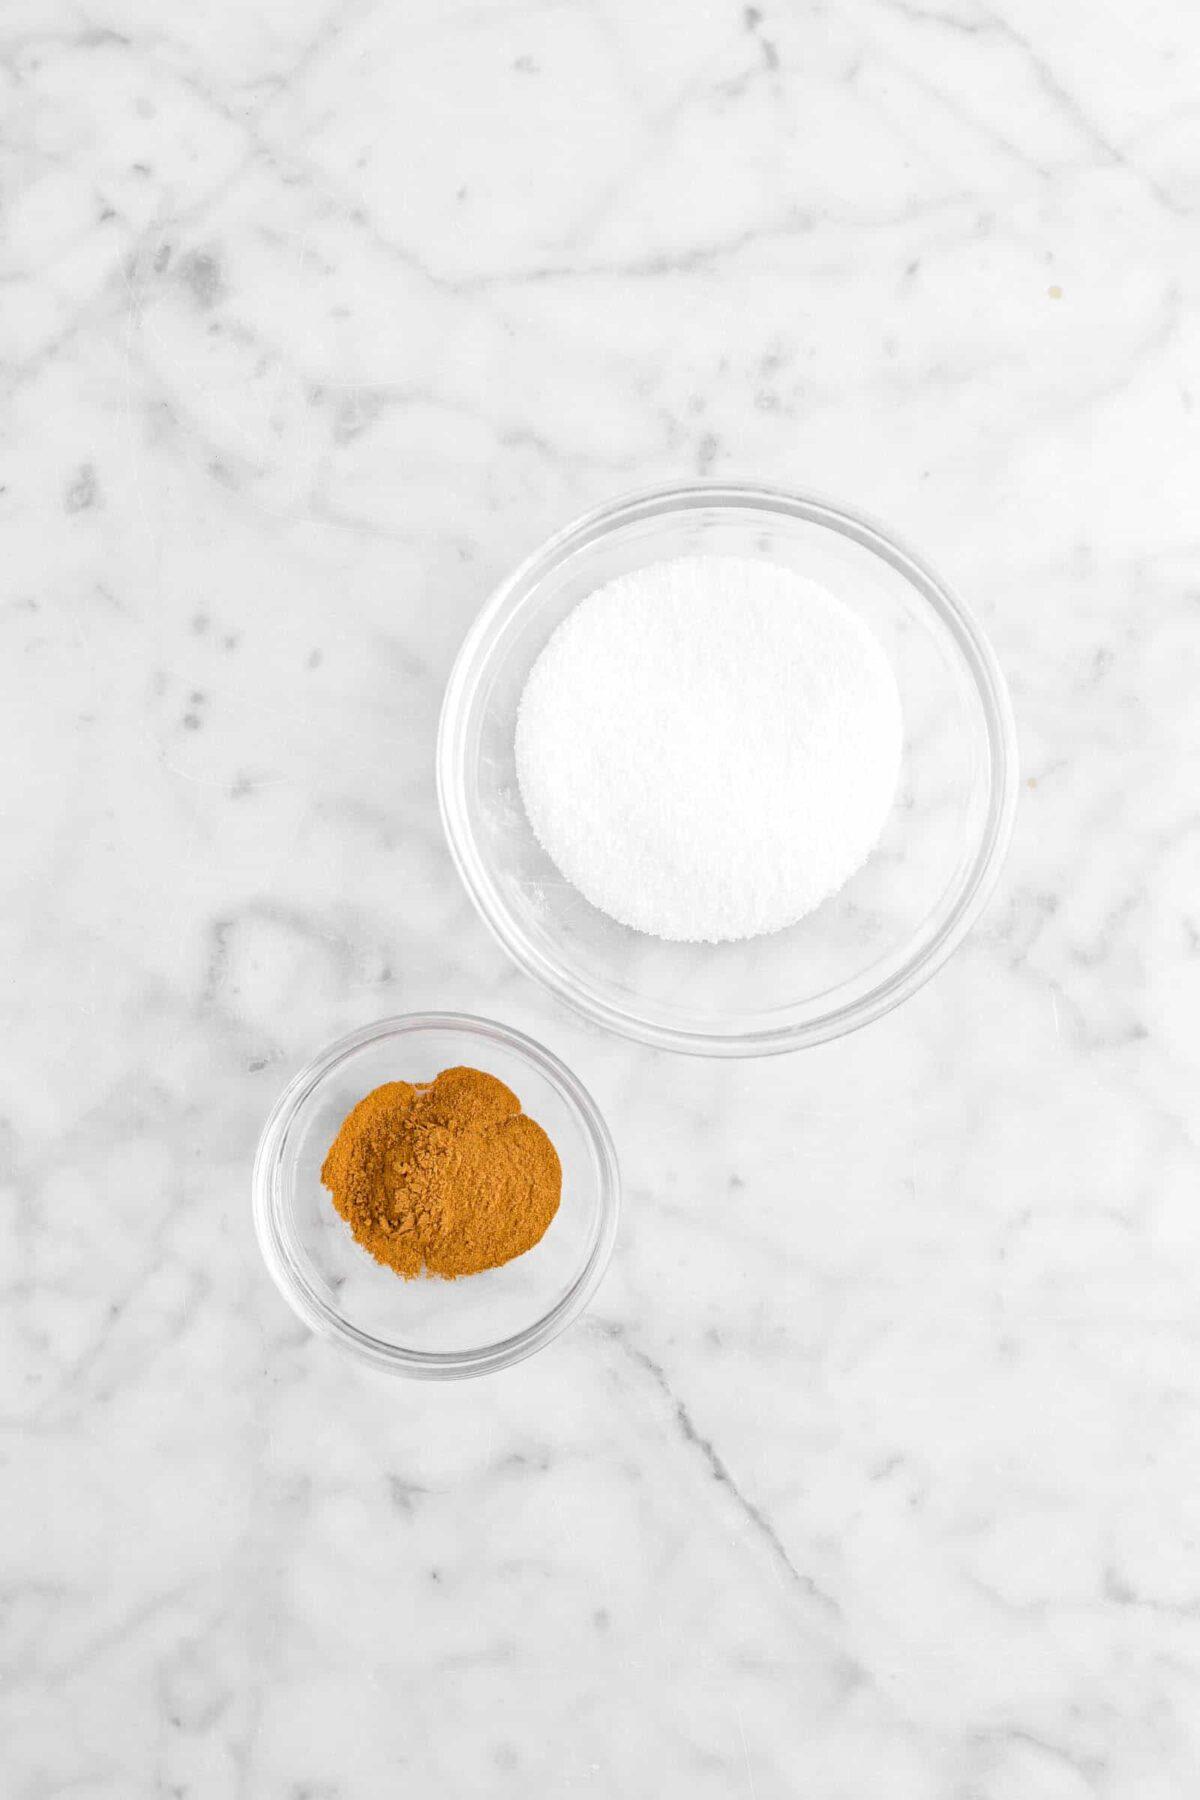 sugar and cinnamon in small bowls